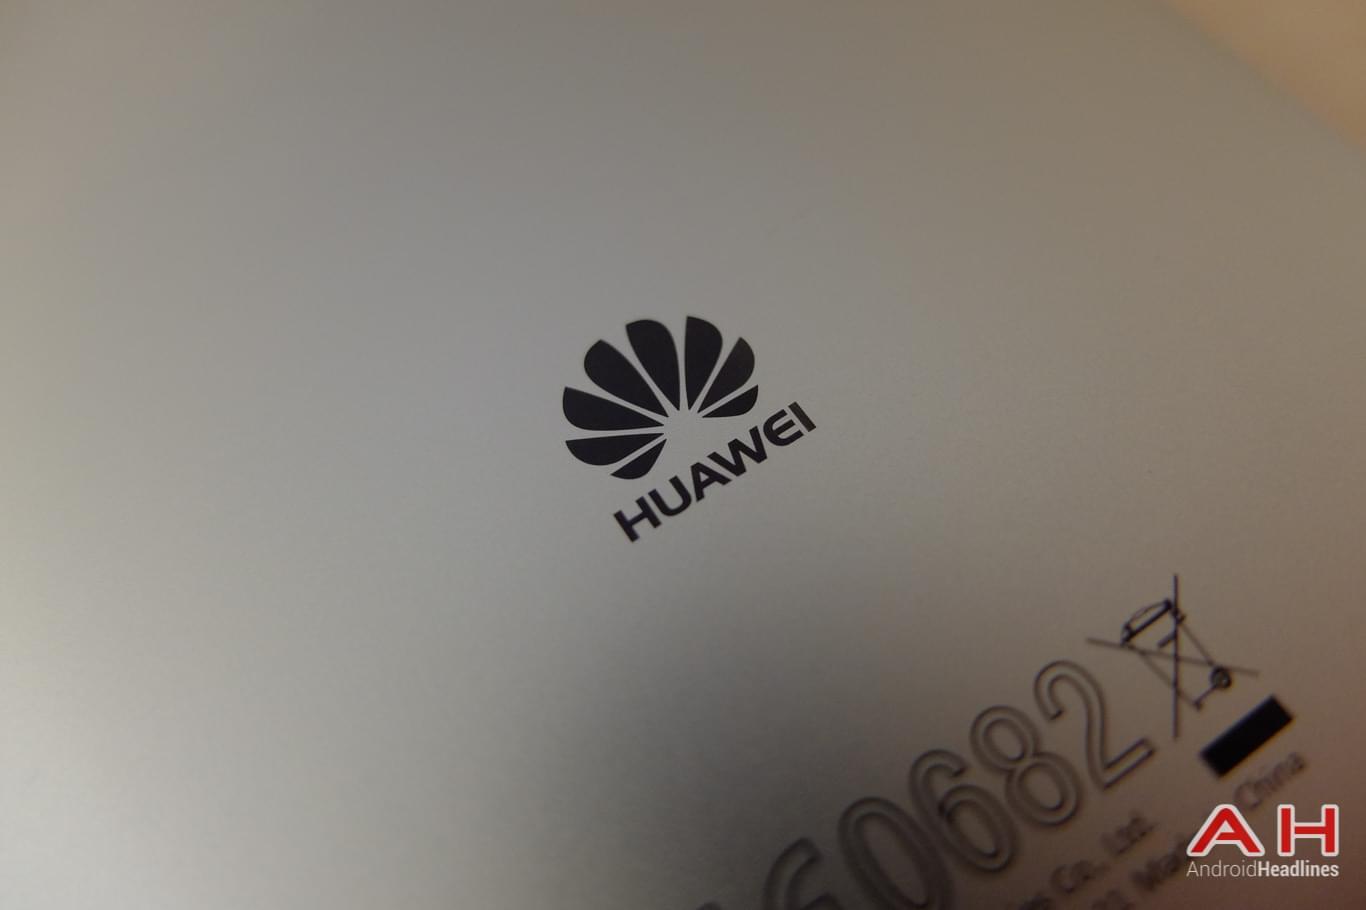 Huawei Nova Plus TD AH 7